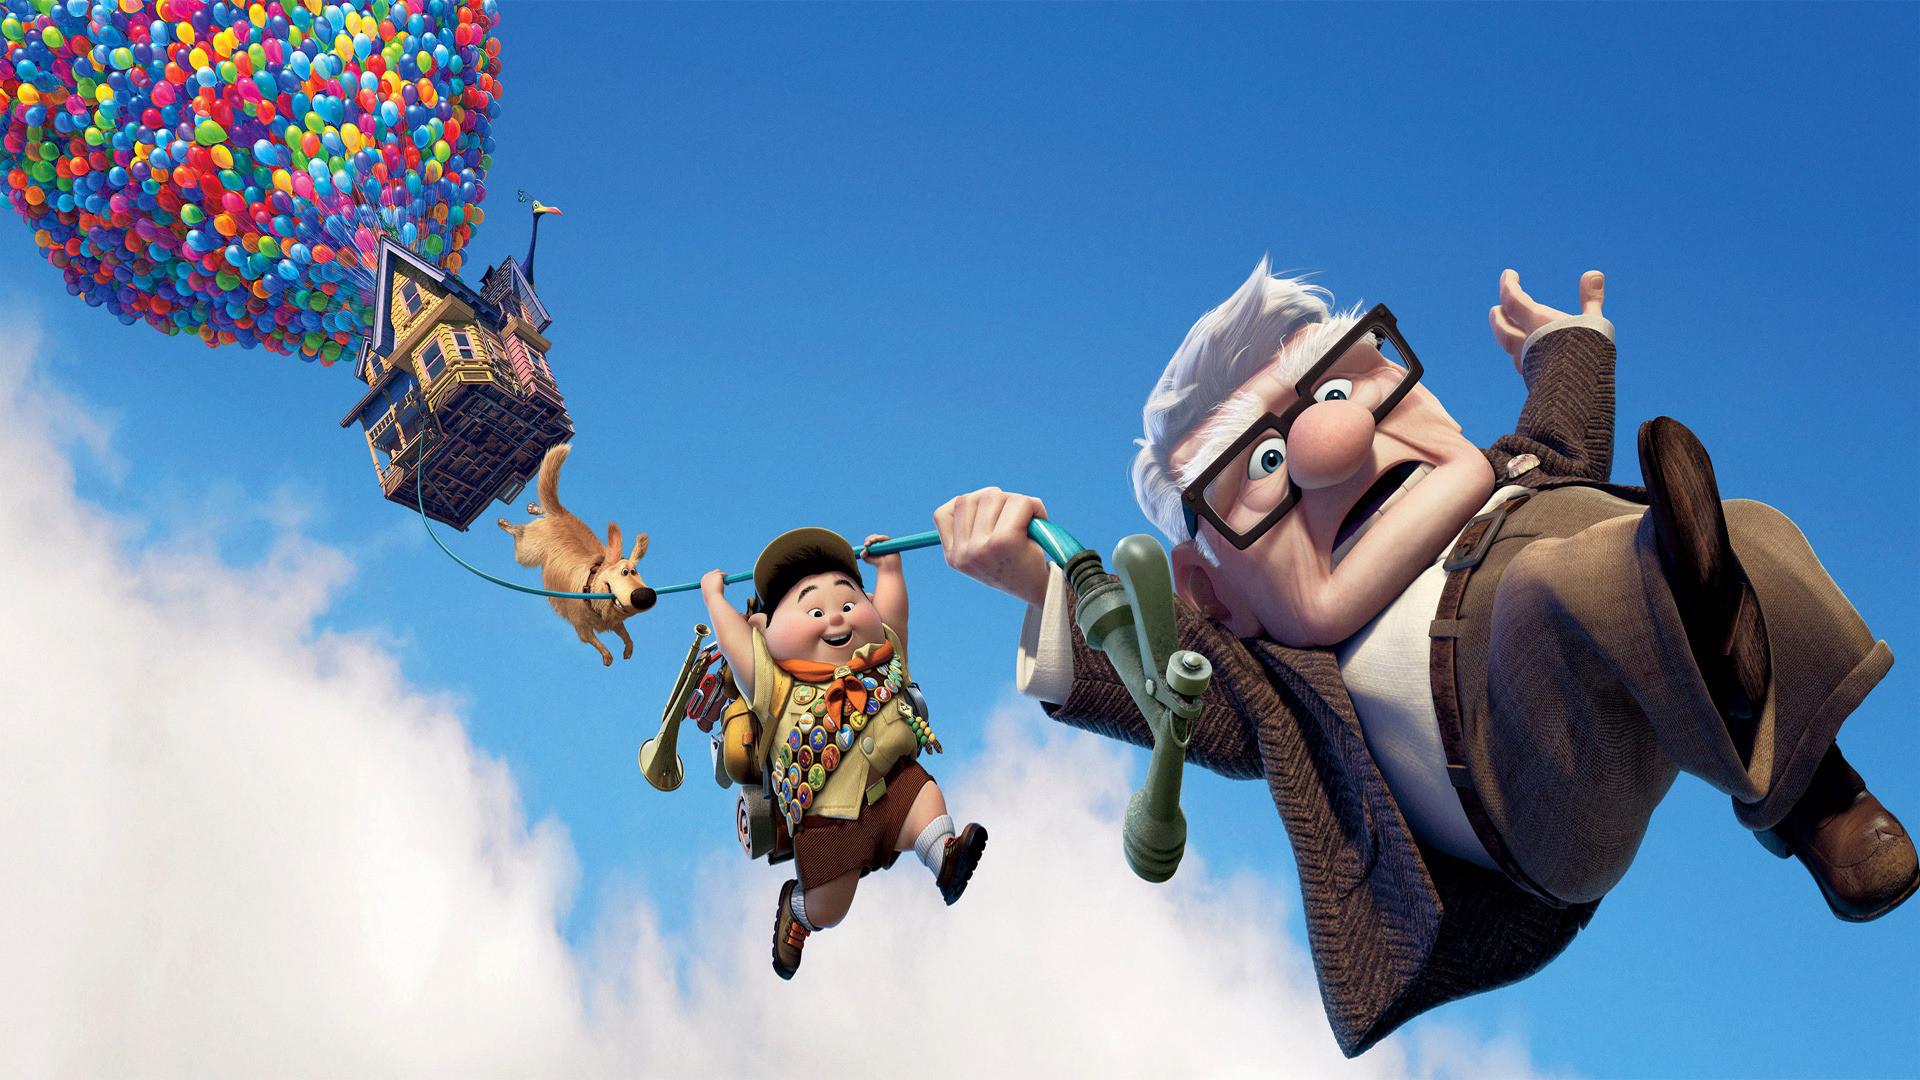 Pixars UP Dual Monitor HD Wallpapers HD Wallpapers 1920x1080